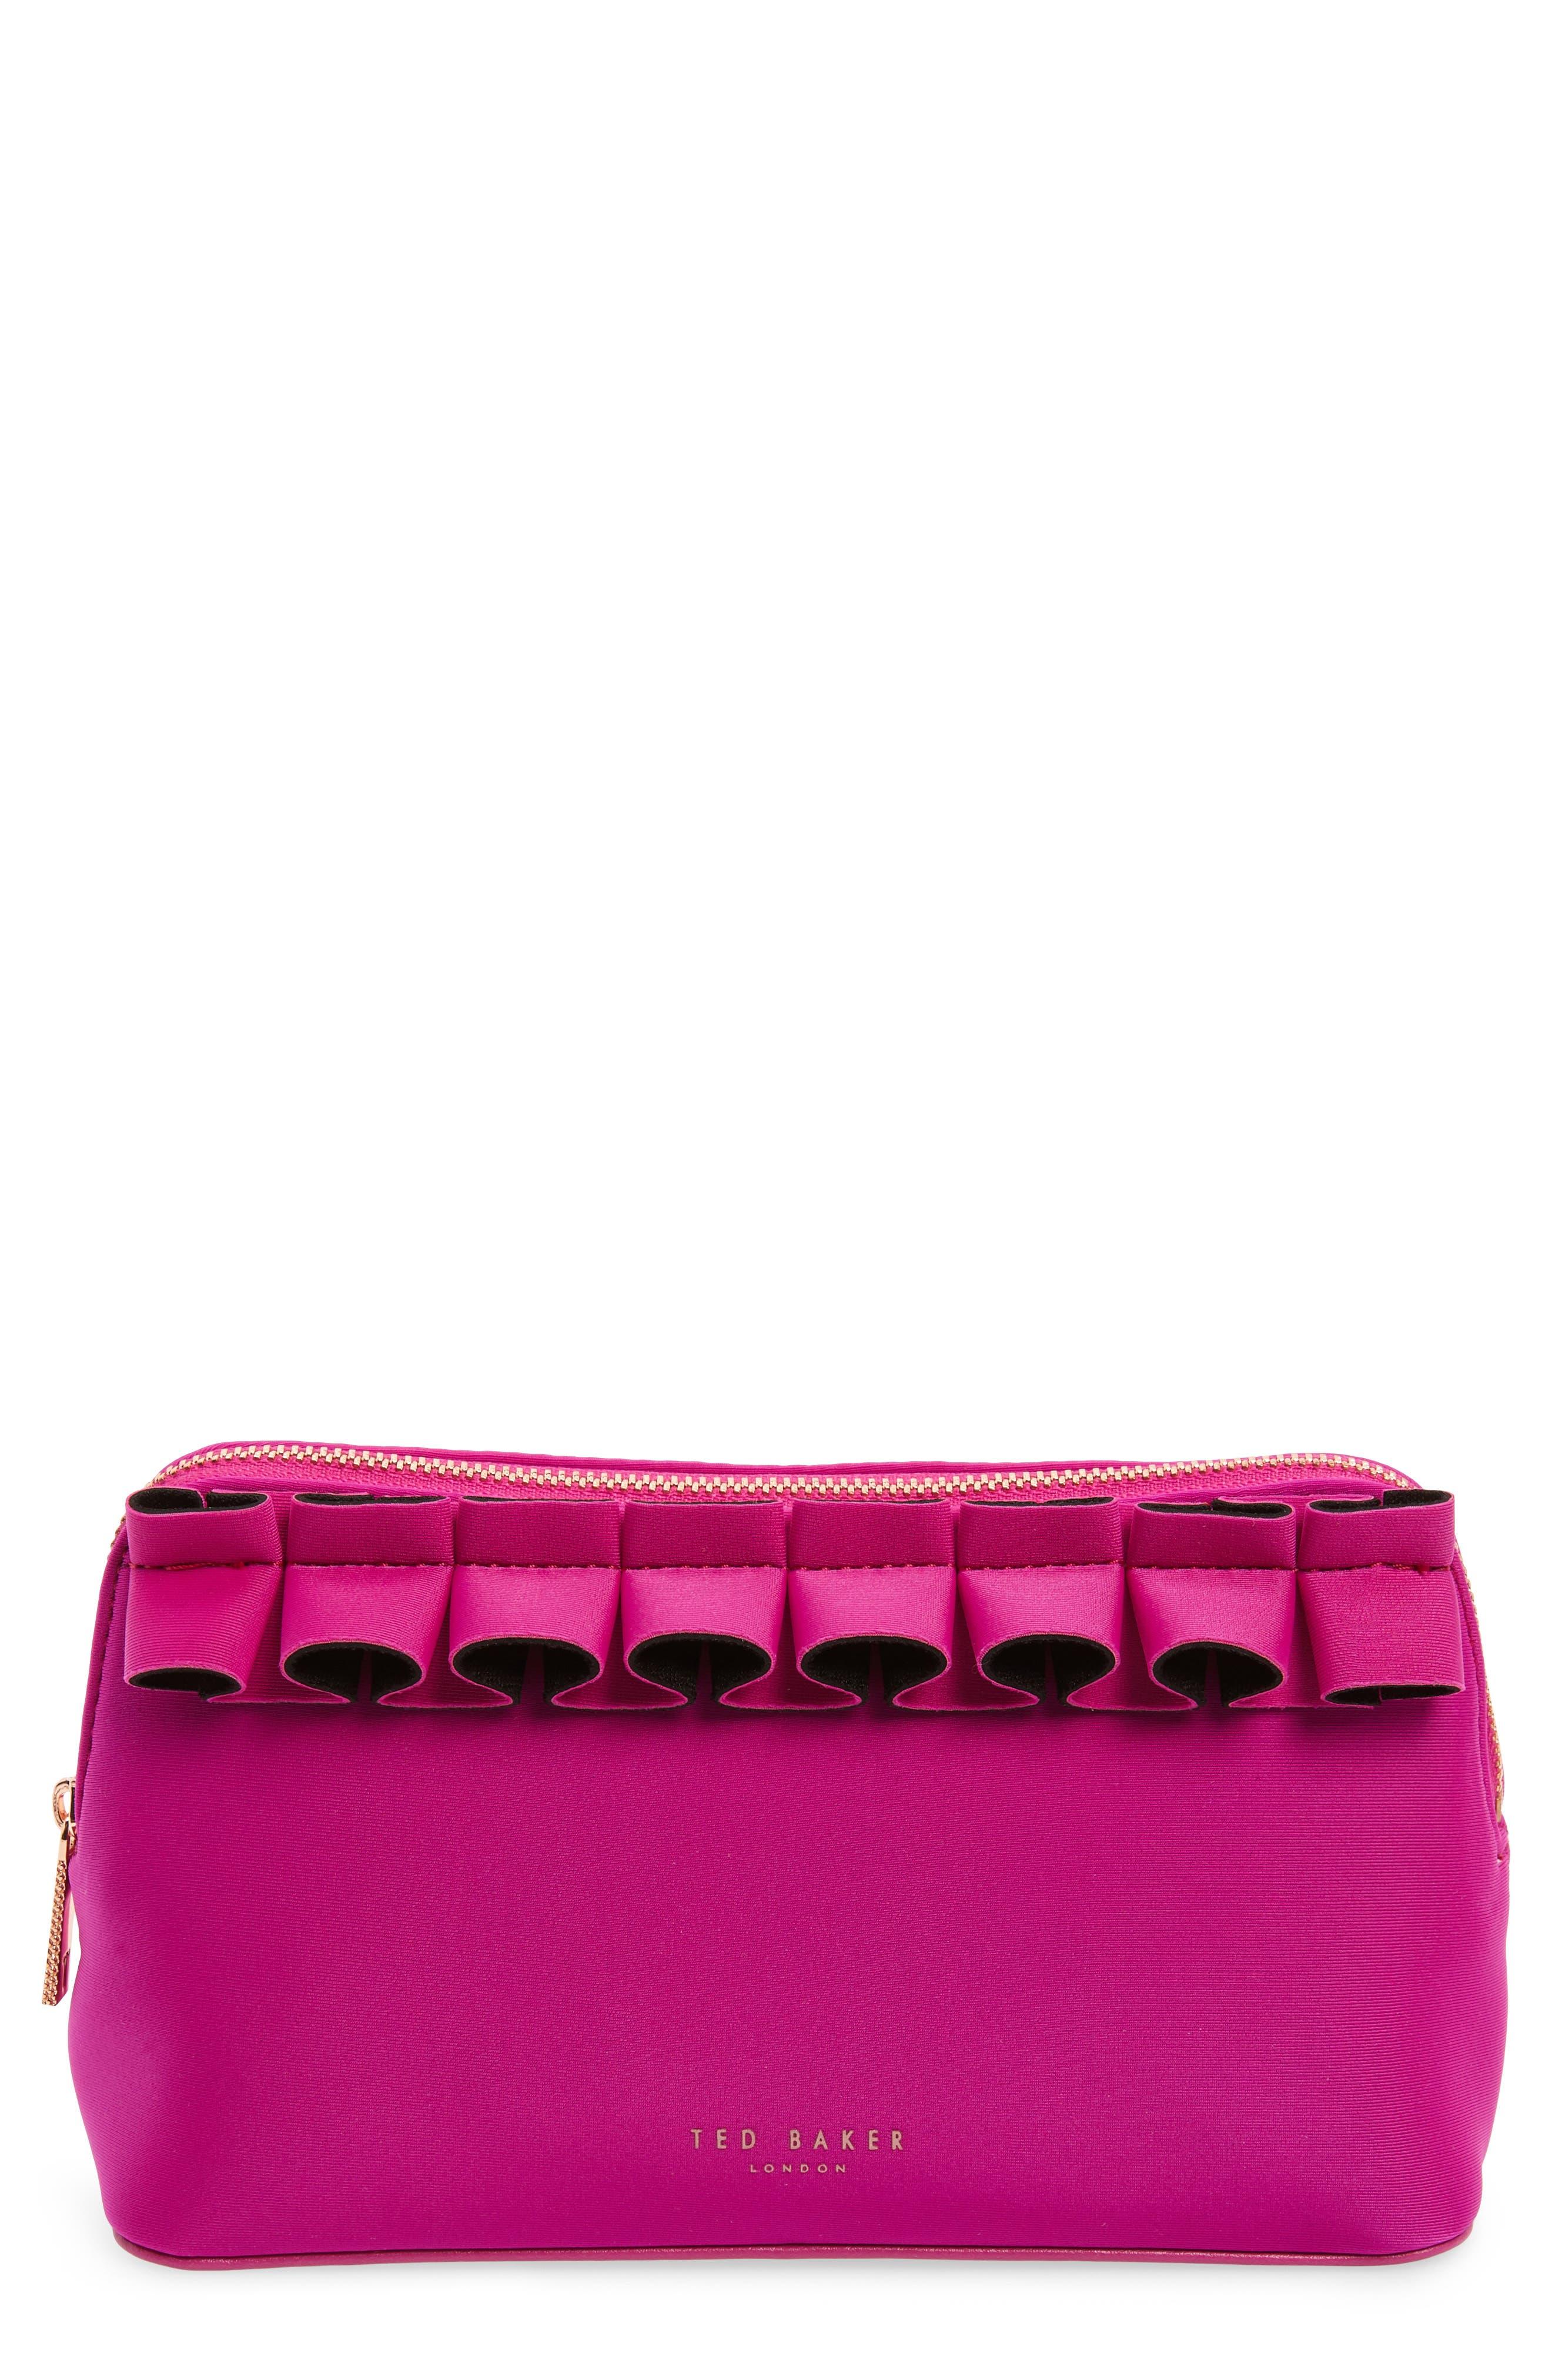 TED BAKER LONDON Adalyn Ruffle Cosmetics Case, Main, color, FUCHSIA